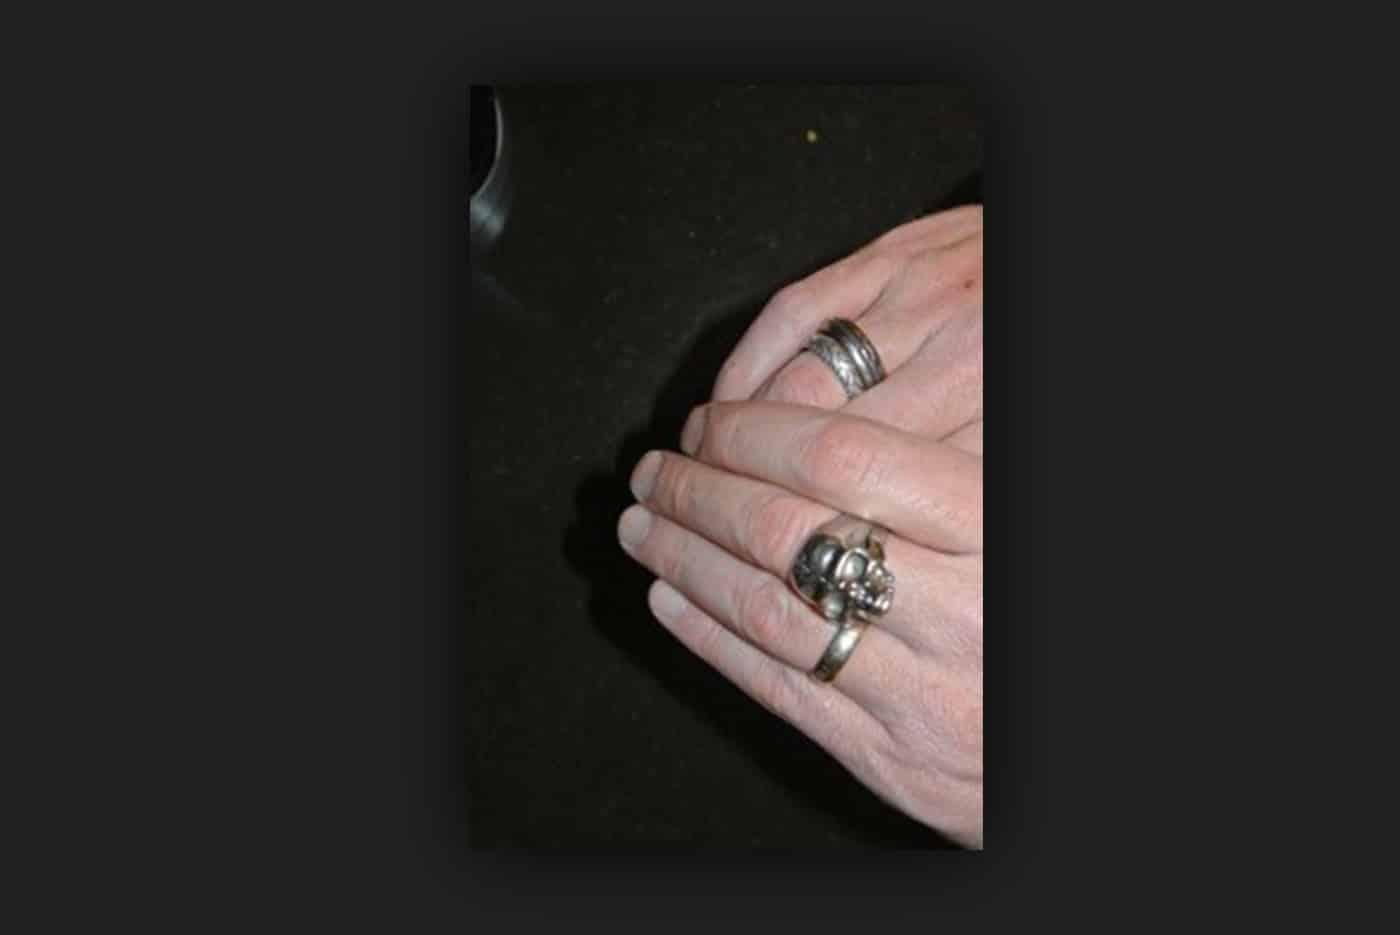 Mesothelioma caregiver Cameron Von St. James' skull ring